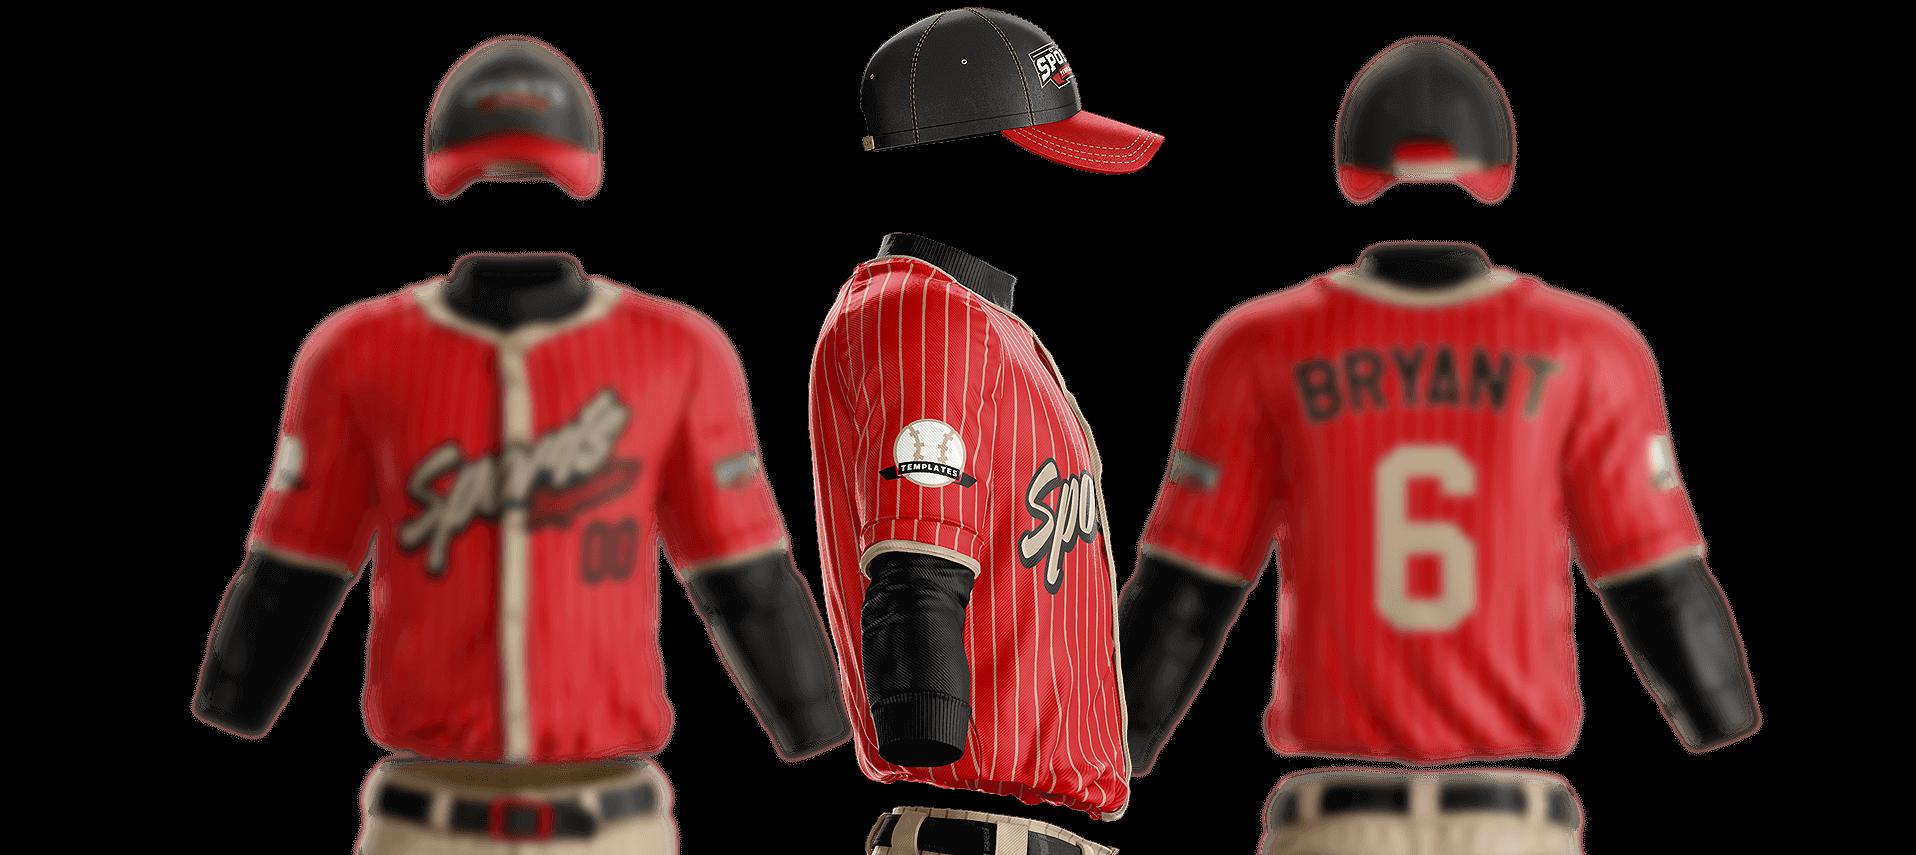 1916x855 Grand Slam Baseball Uniform Template Sports Templates